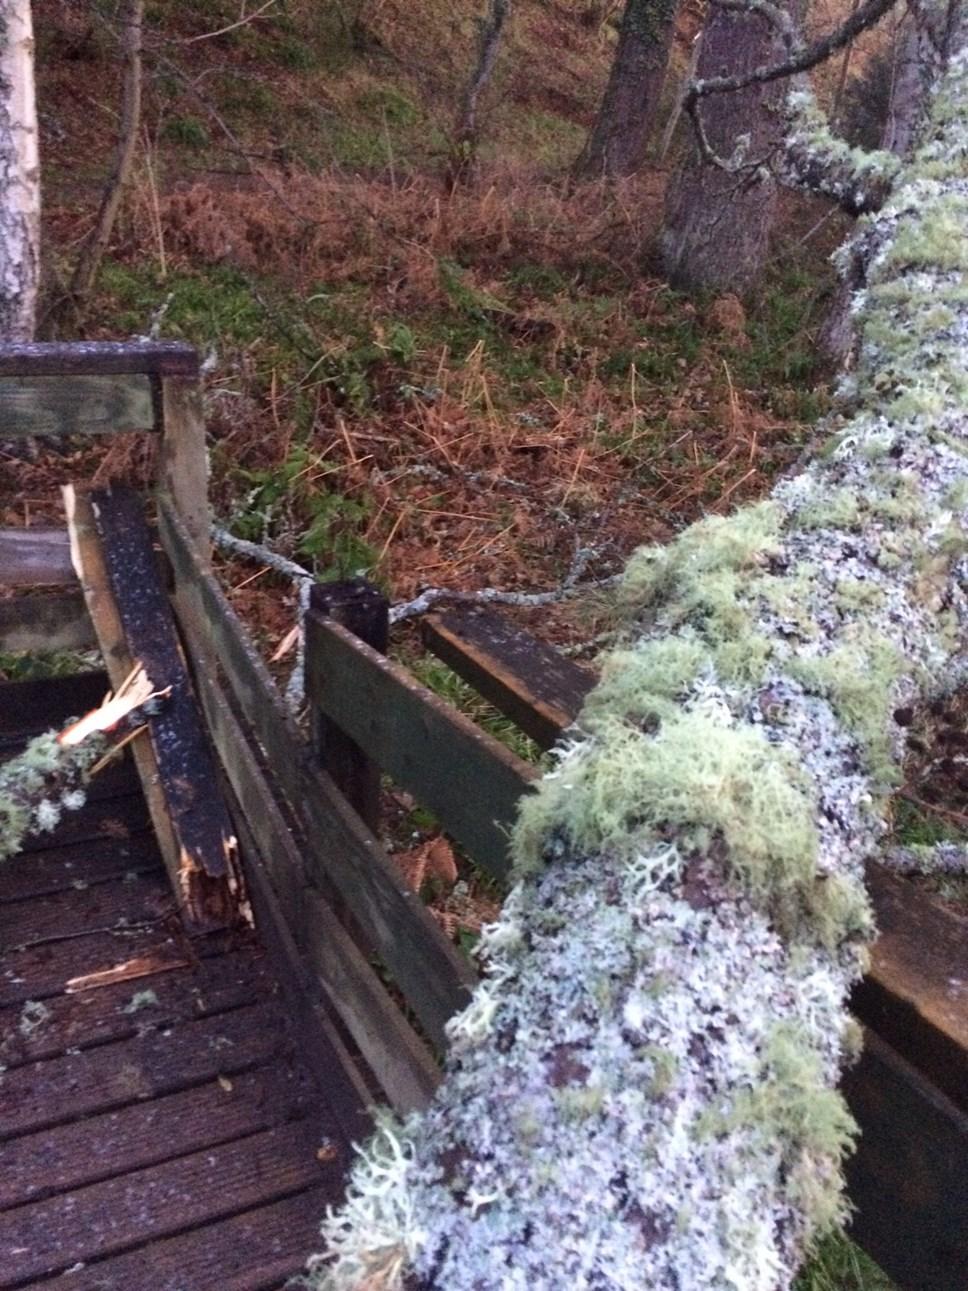 Forres footbridge damaged by storm Ciara: sanquhar bridge